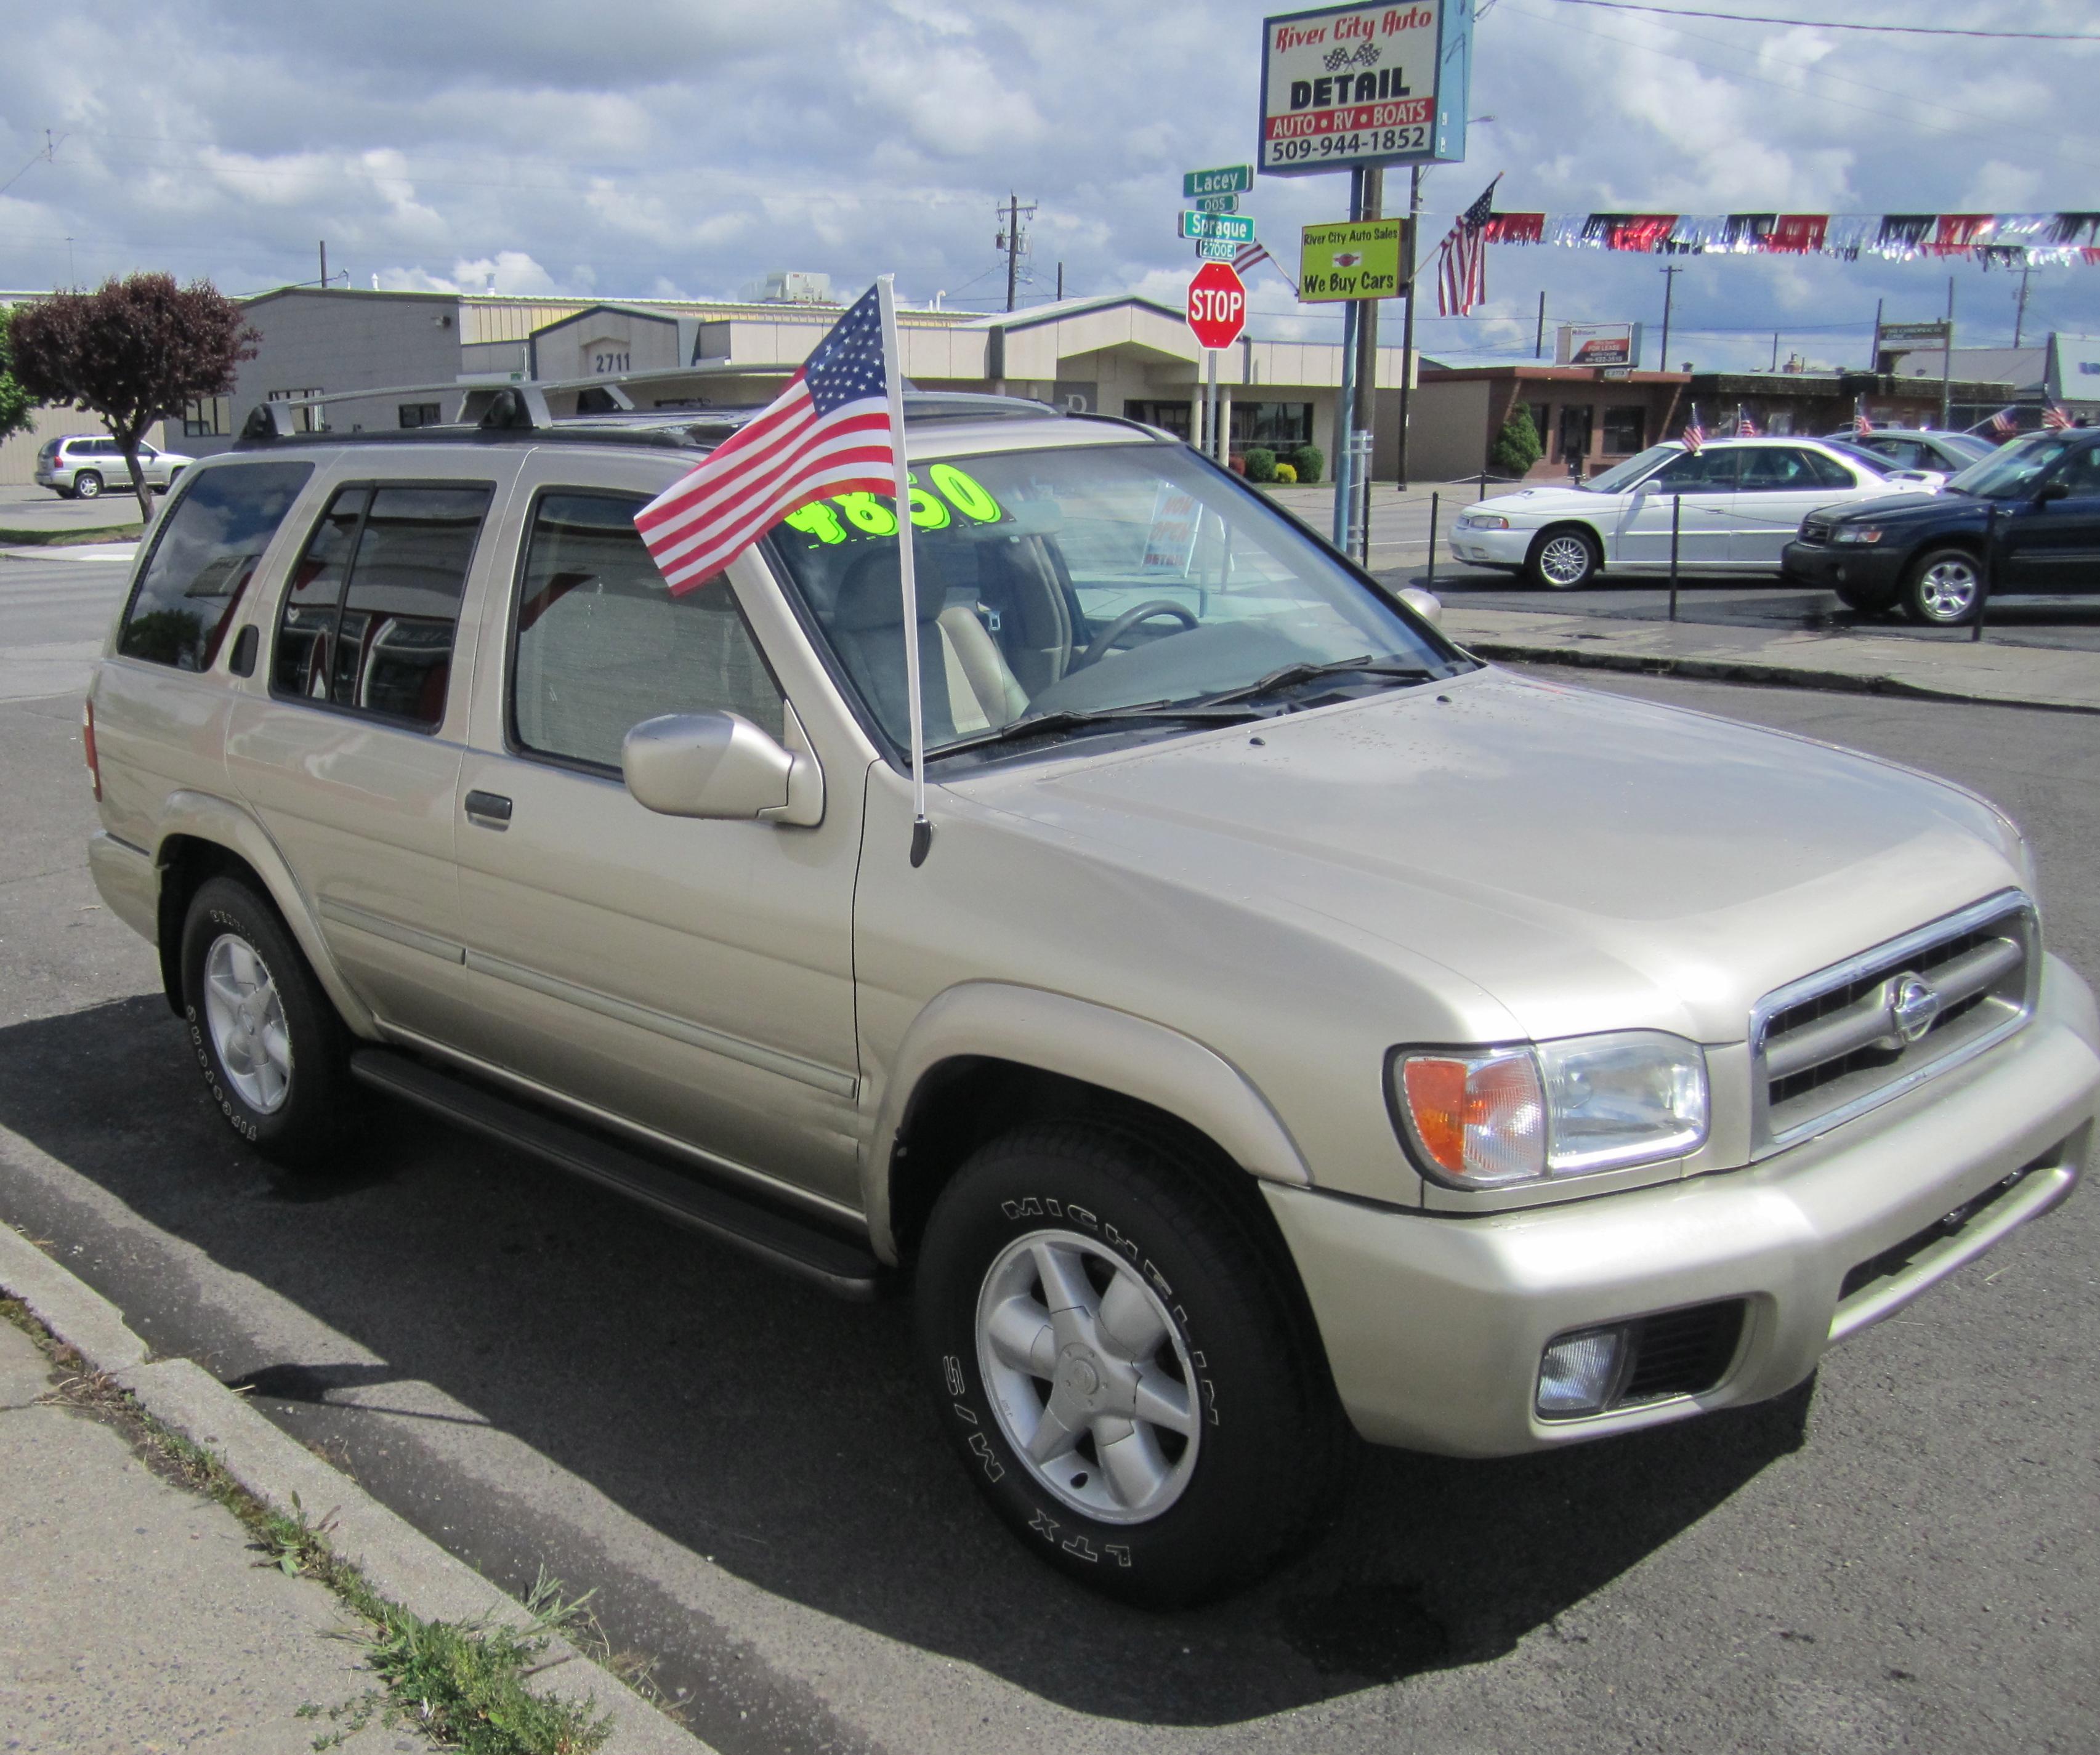 River city auto sales spokane wa 99202 yp com